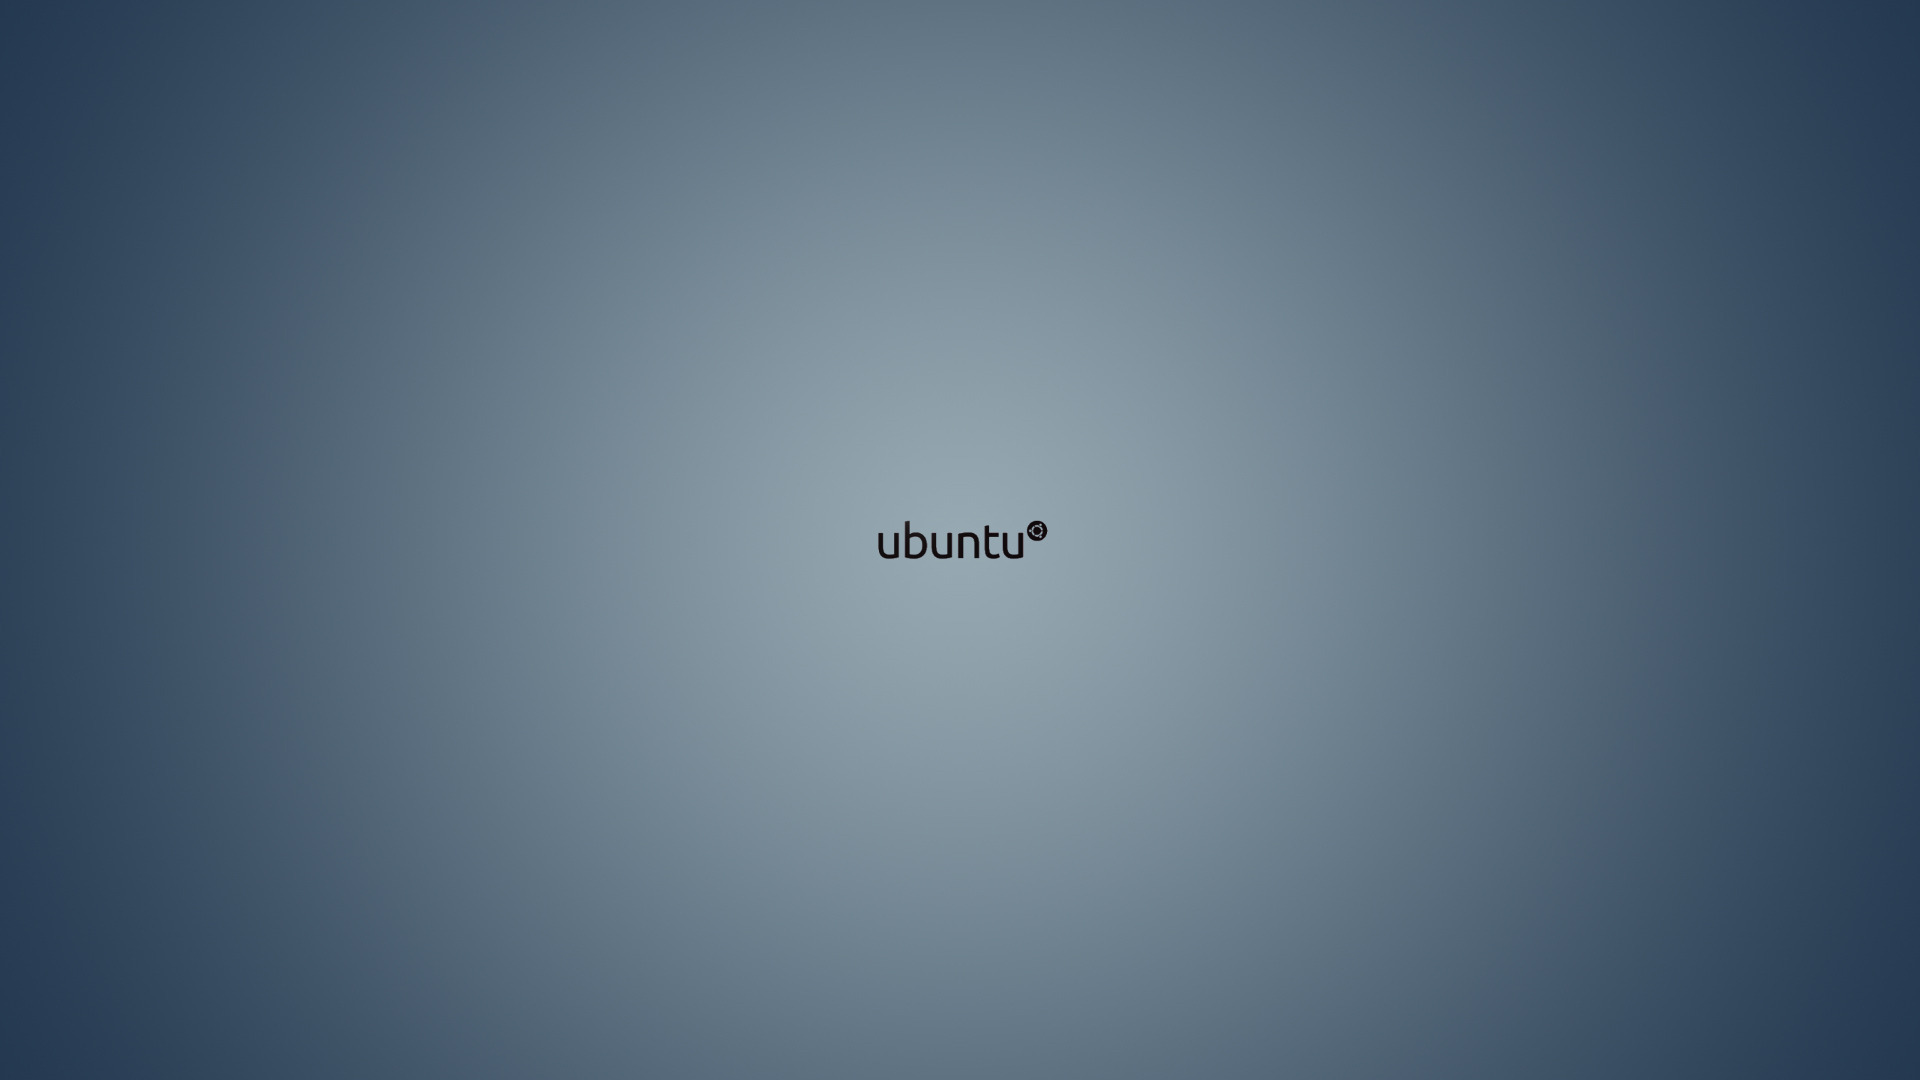 ubuntu wallpaper linux morzze - photo #5